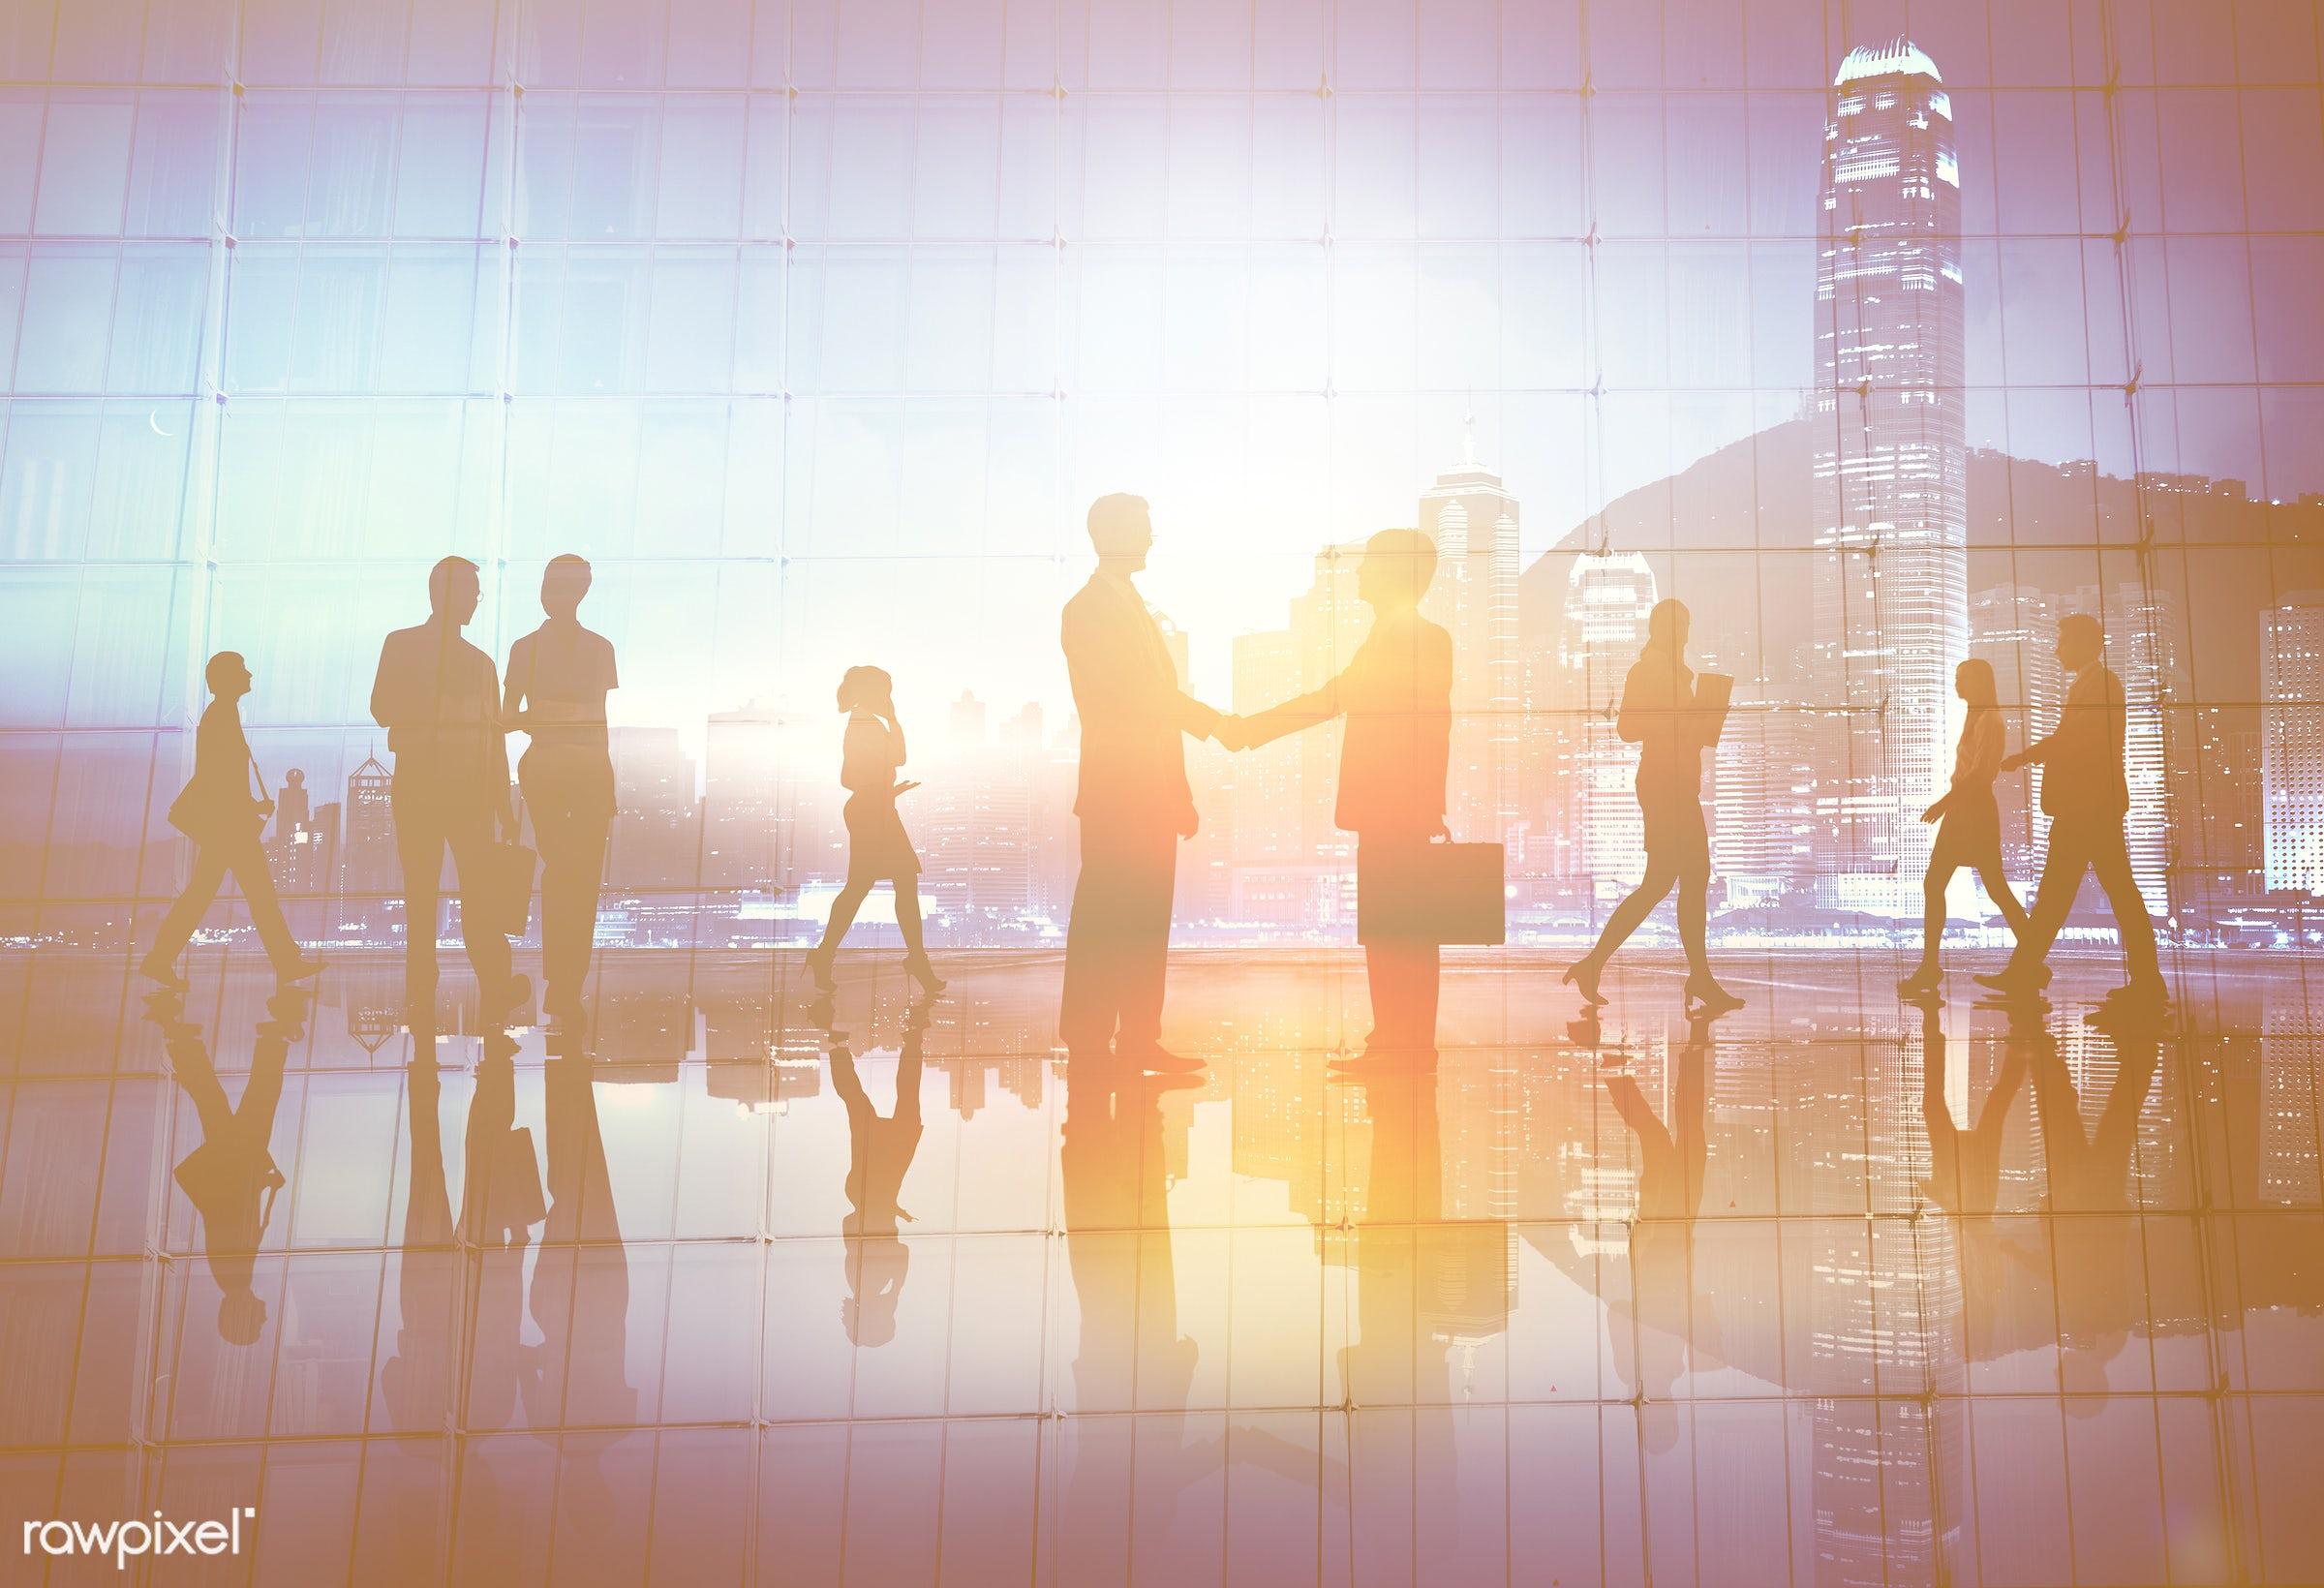 advice, agreement, back lit, board room, brainstorming, buildings, business, business people, businessmen, businesswomen,...